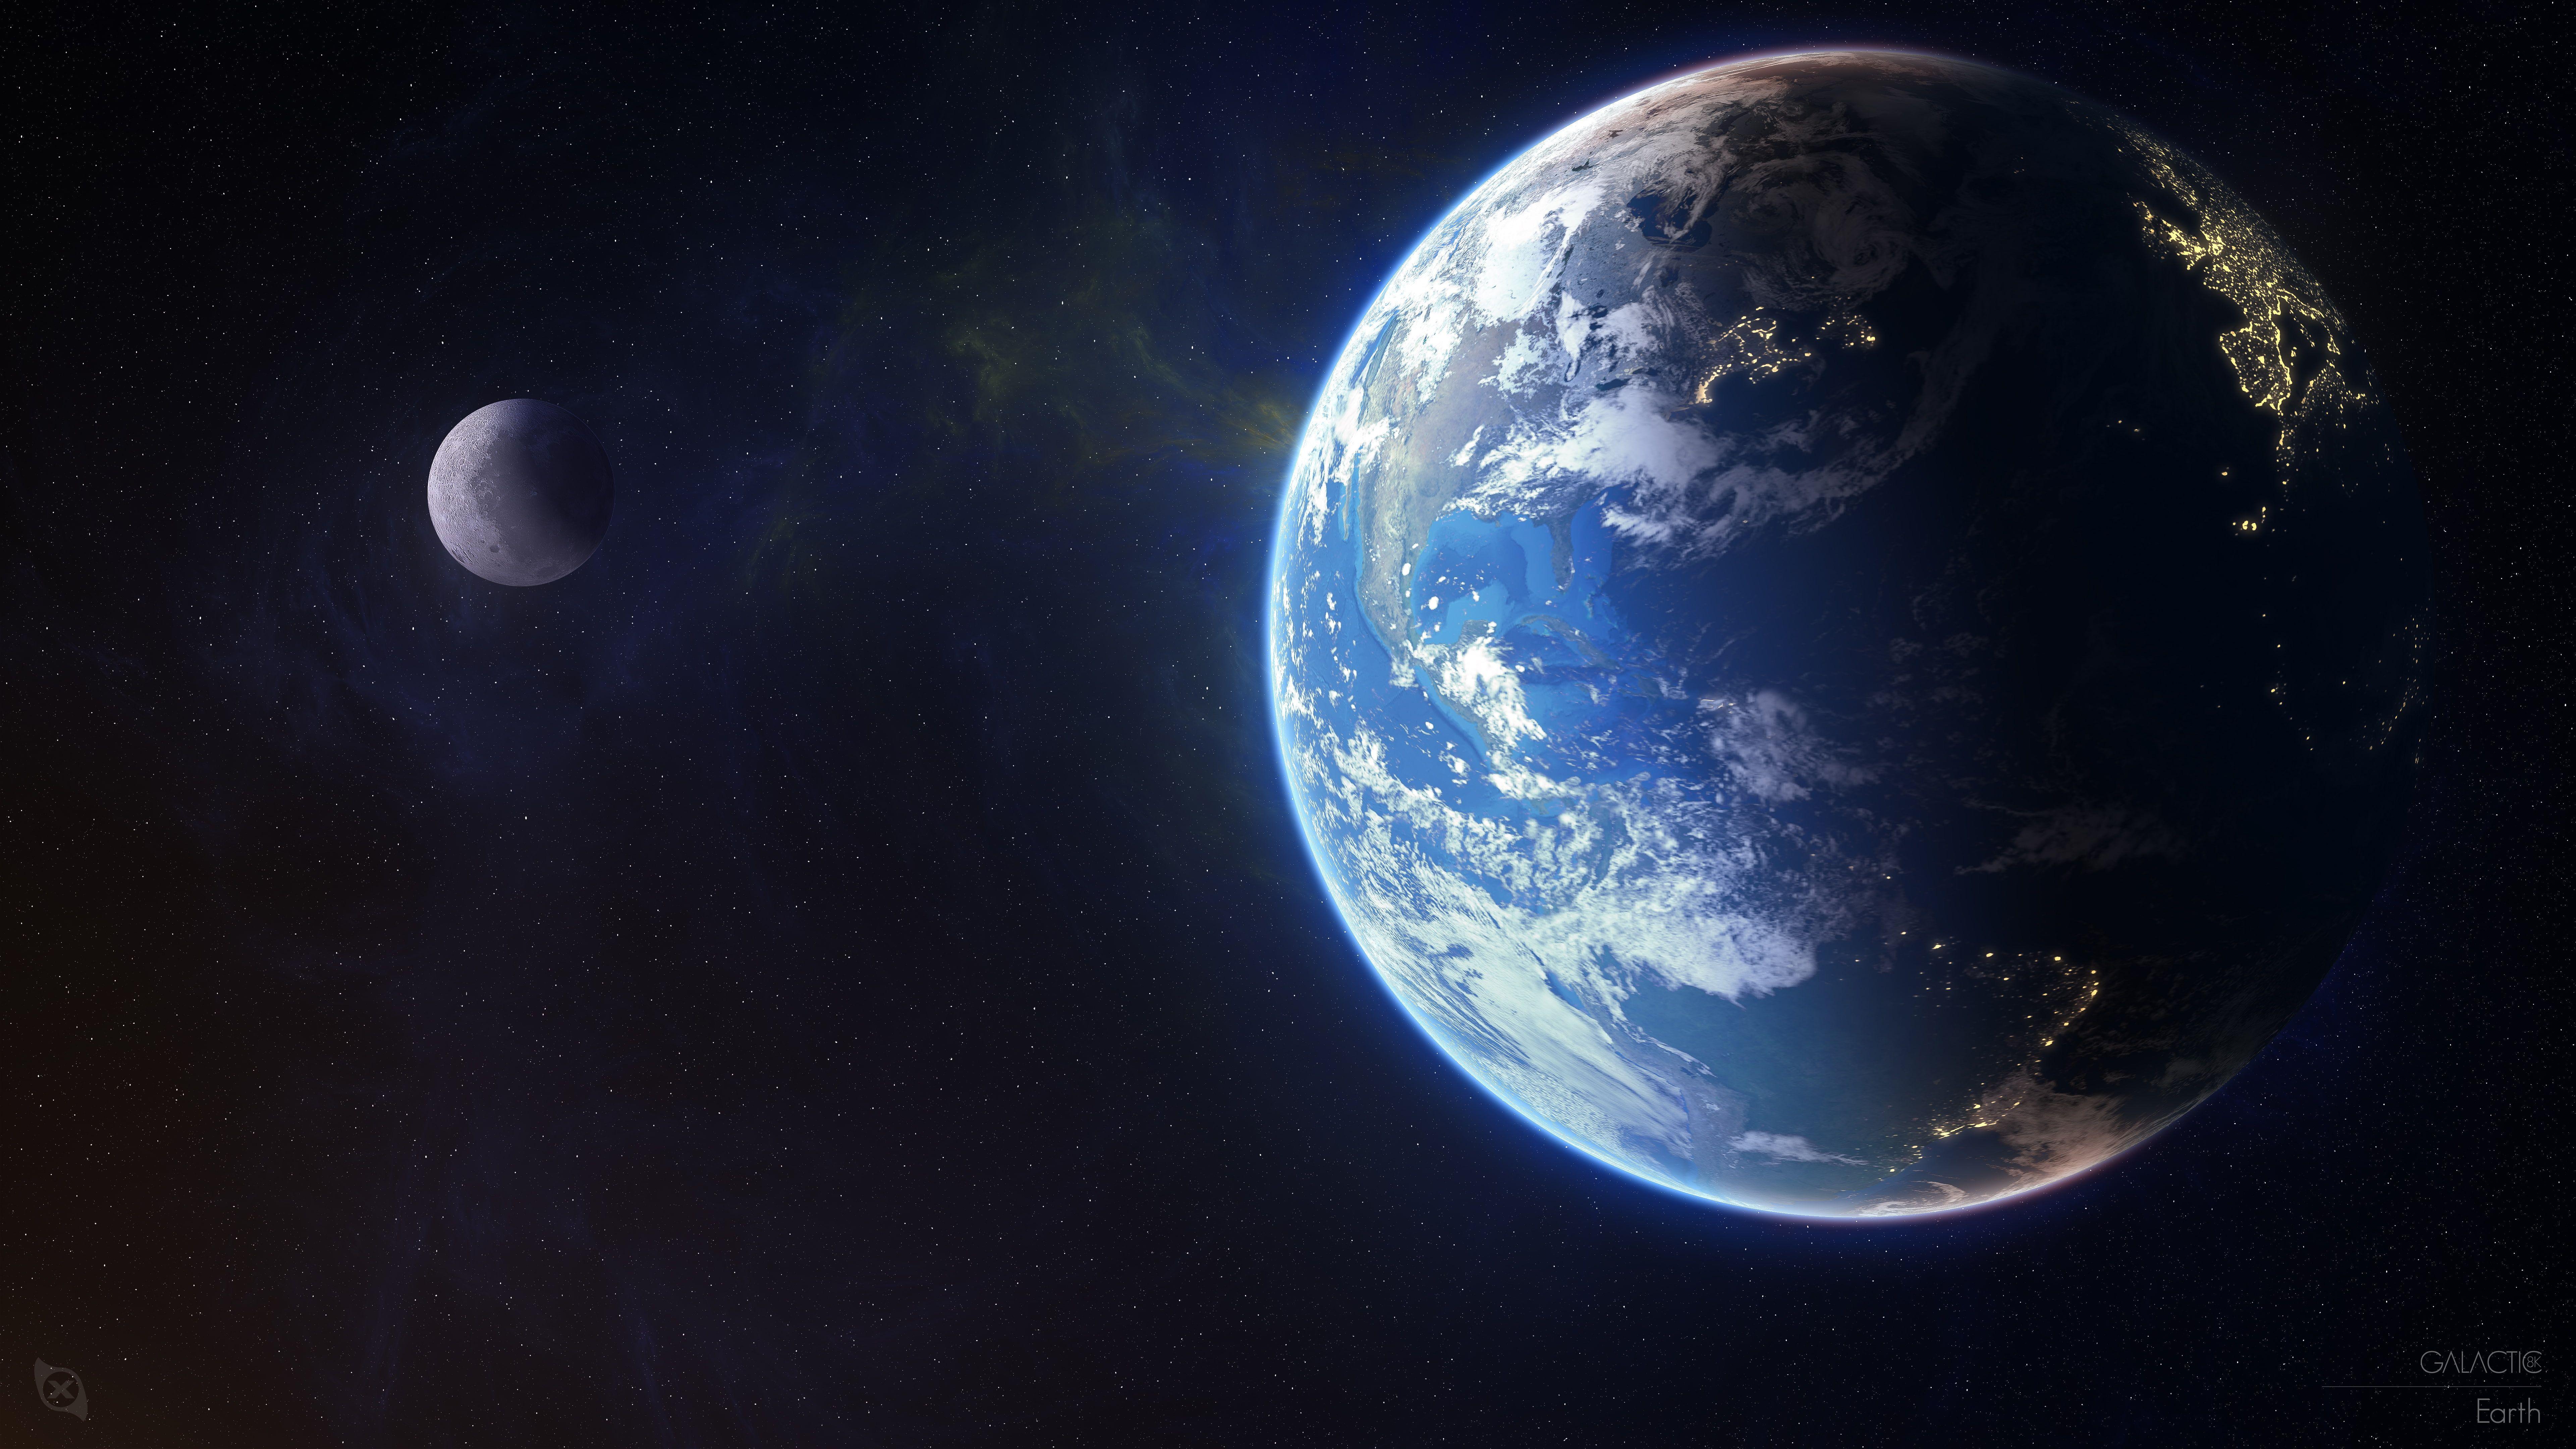 4k Planet Earth 8k 8k Wallpaper Hdwallpaper Desktop In 2020 Wallpaper Earth Hd Wallpaper Planets Wallpaper